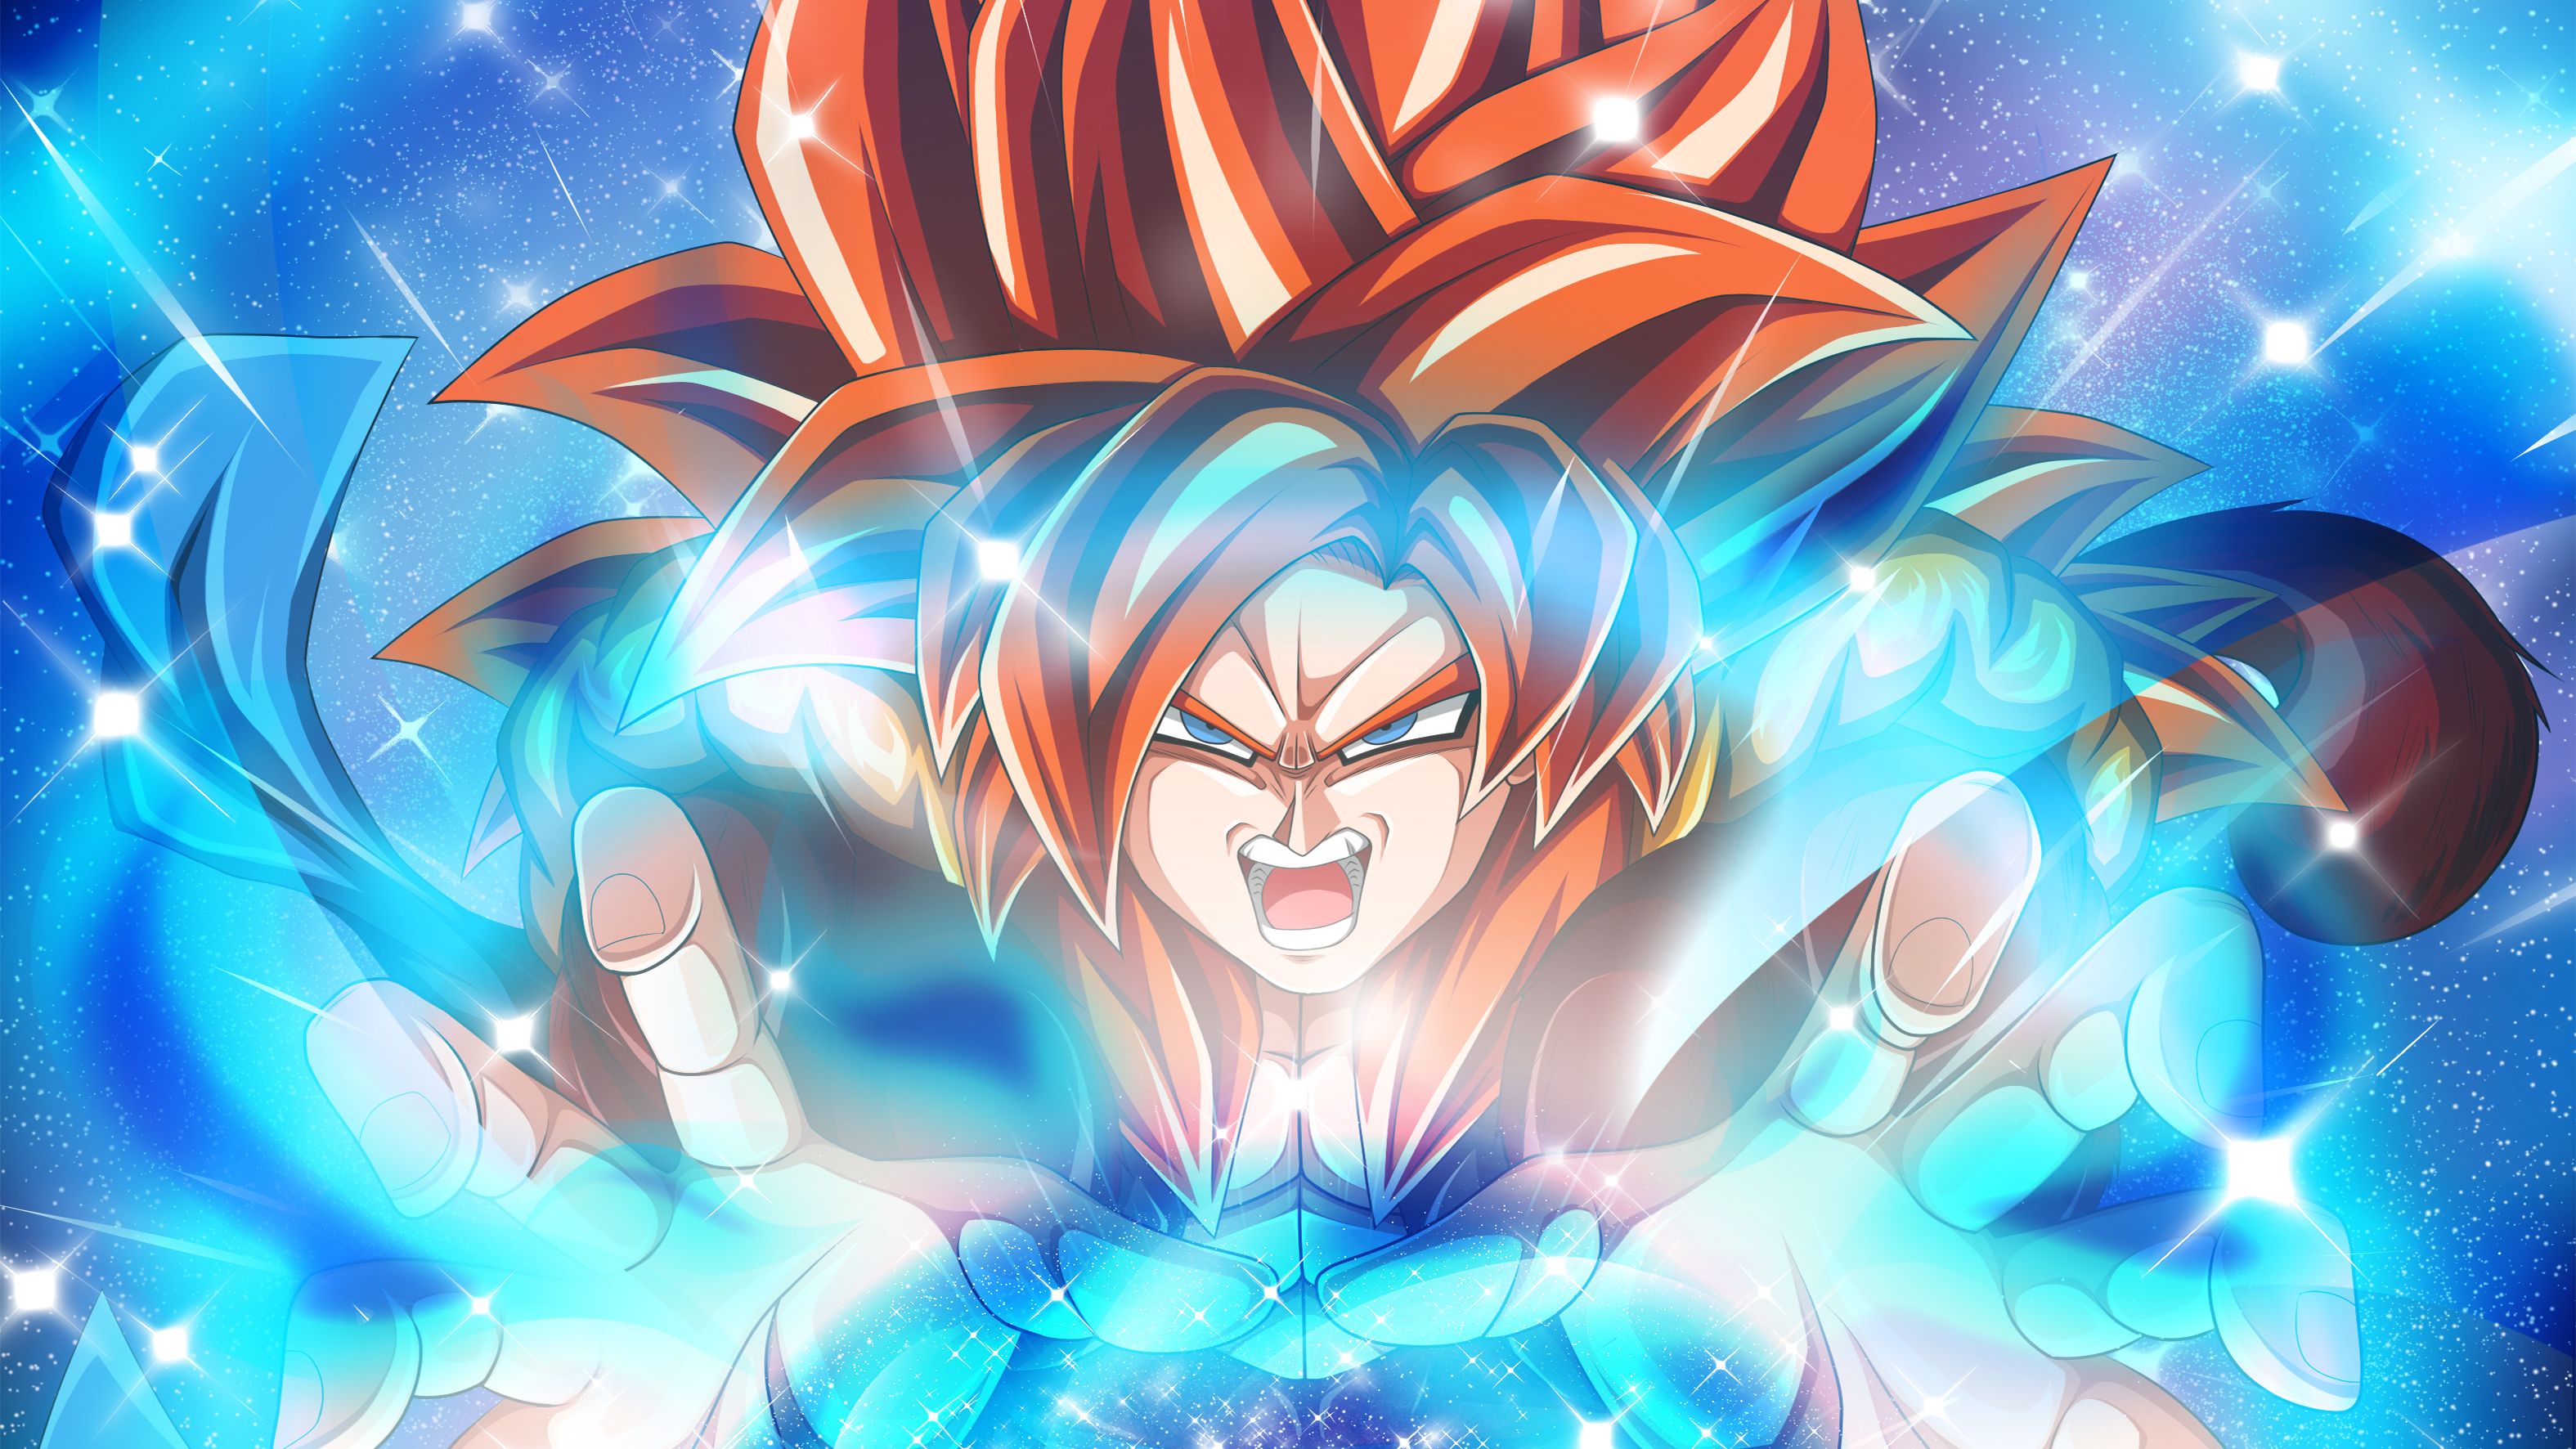 Dragon Ball Super Saiyan 4 Anime 4k, HD Games, 4k ...